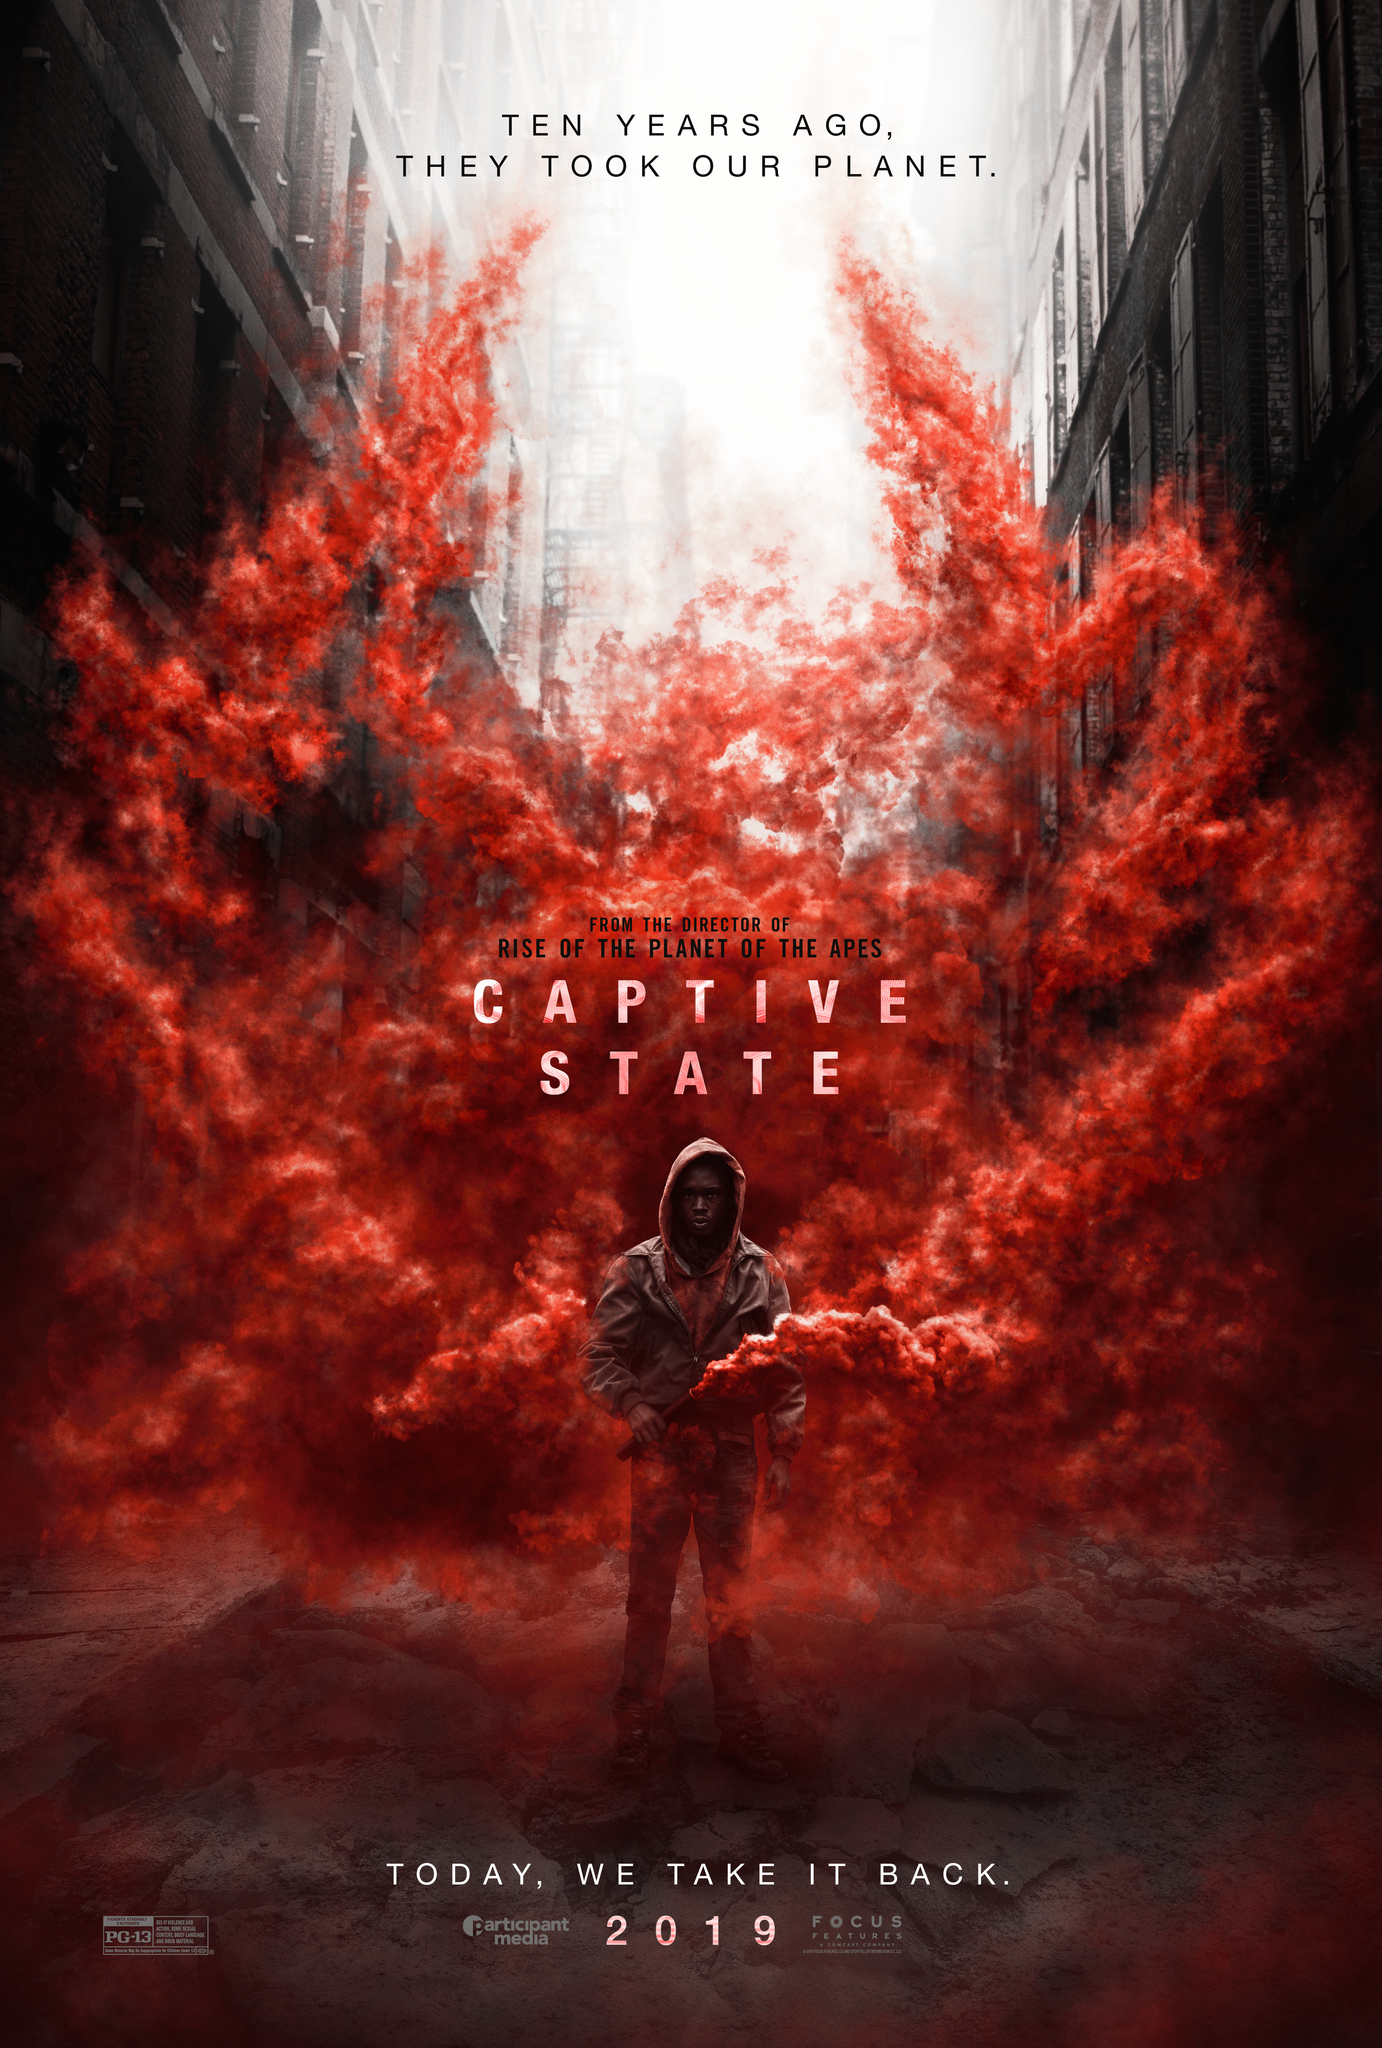 Captive State Poster1.jpg